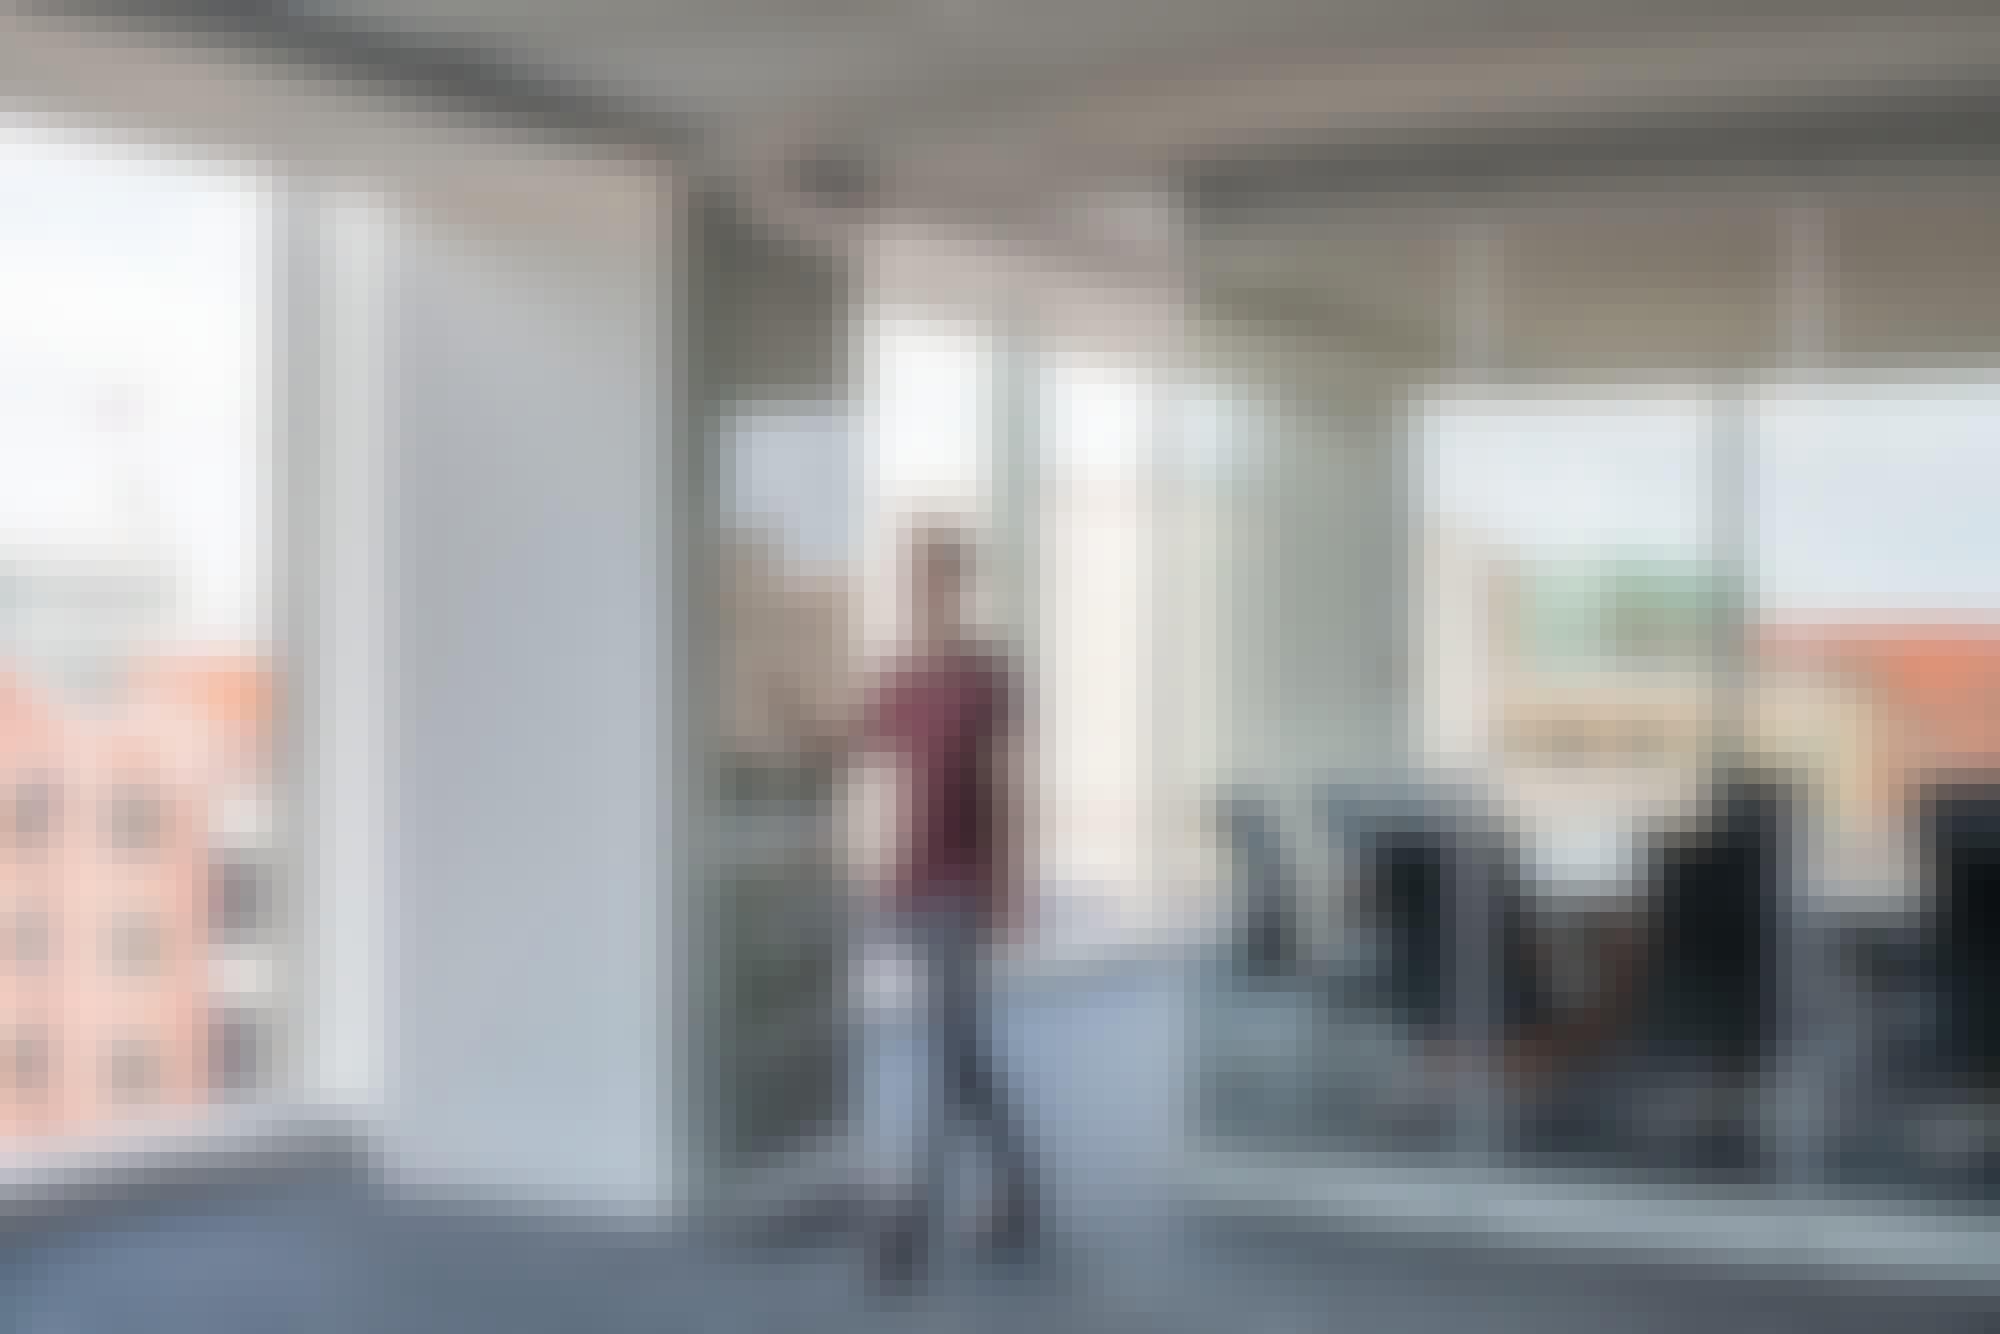 walking-through-swing-door-in-frameless-glass-wall